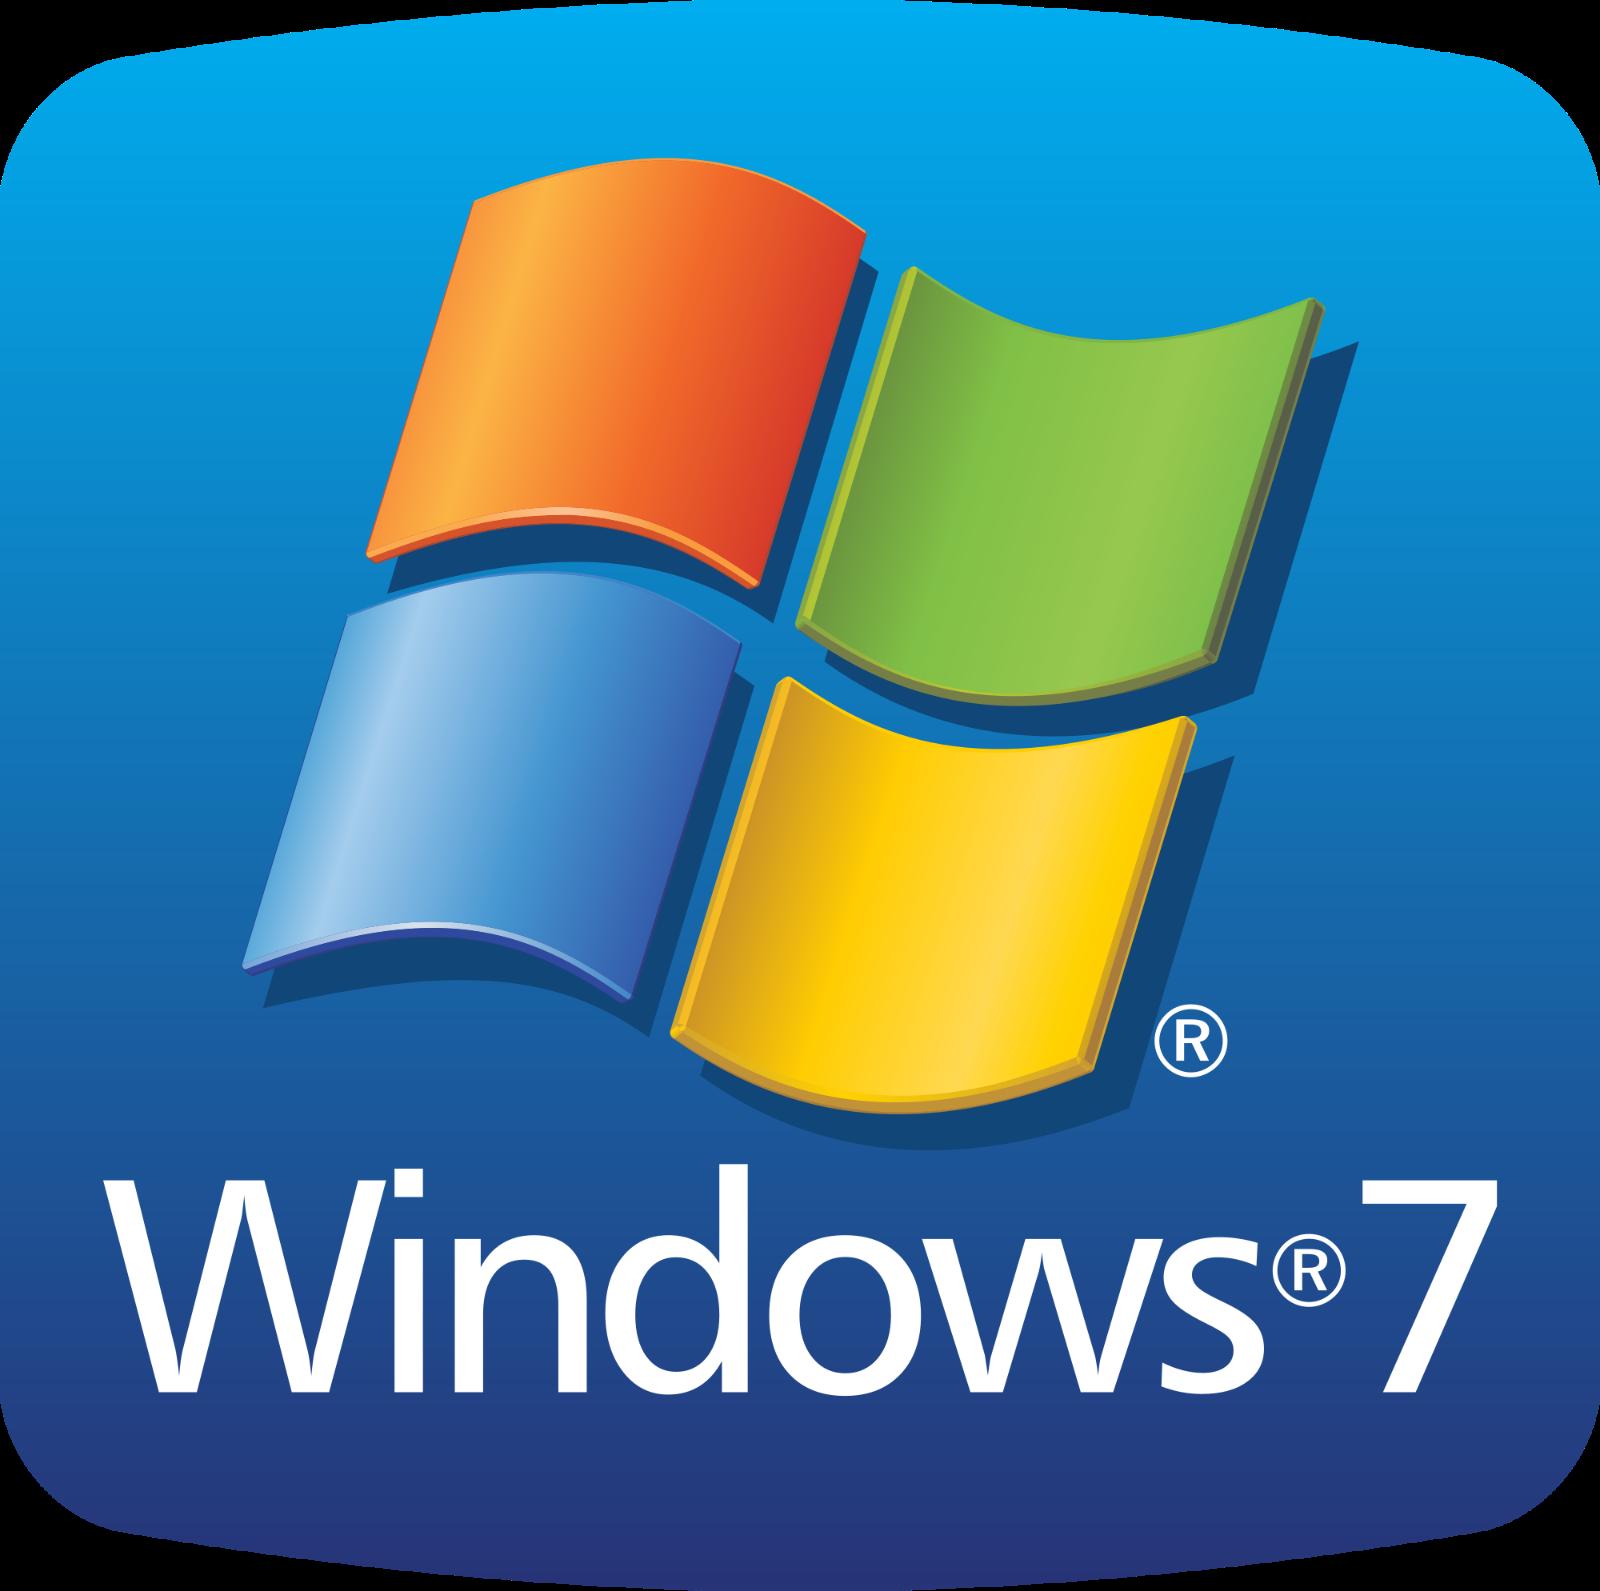 Windows 7 Home Premium Professional Ultimate and 17 similar